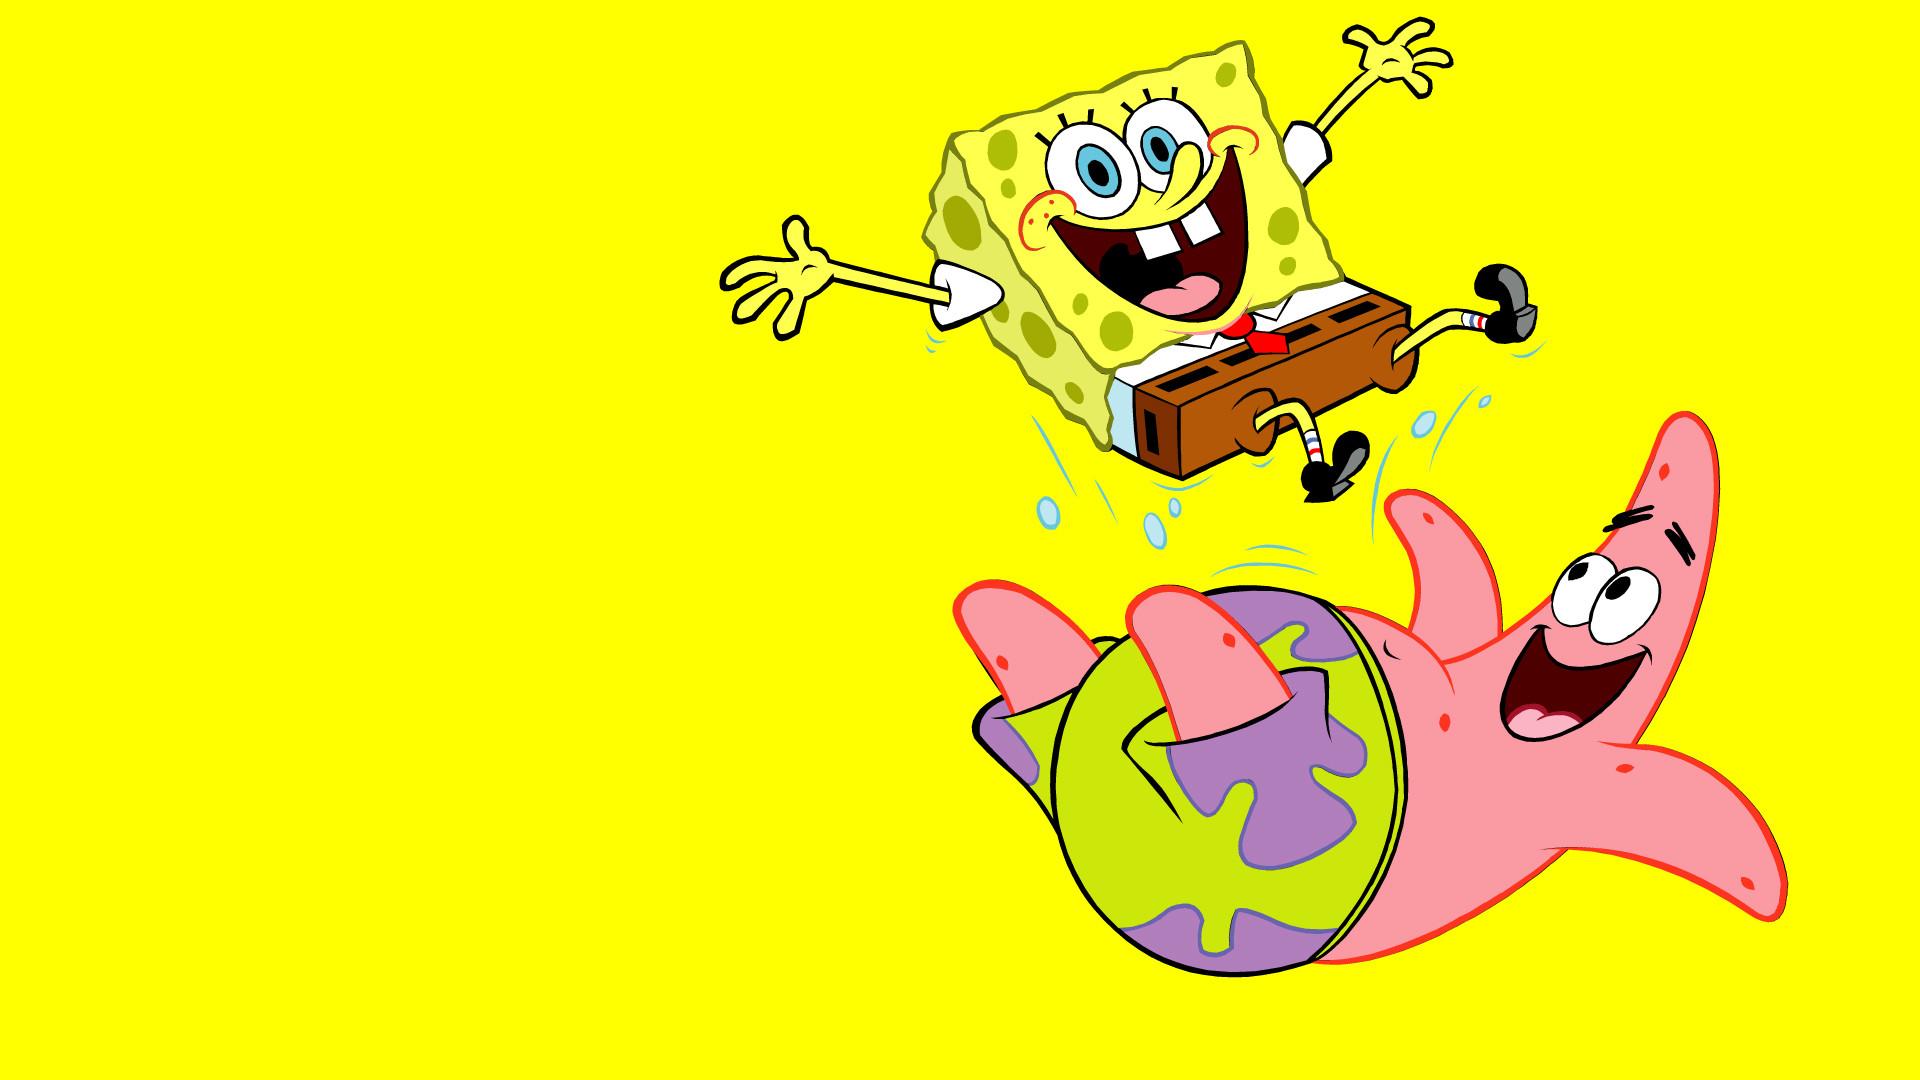 Res: 1920x1080, Spongebob Squarepants HD Wallpapers for desktop download